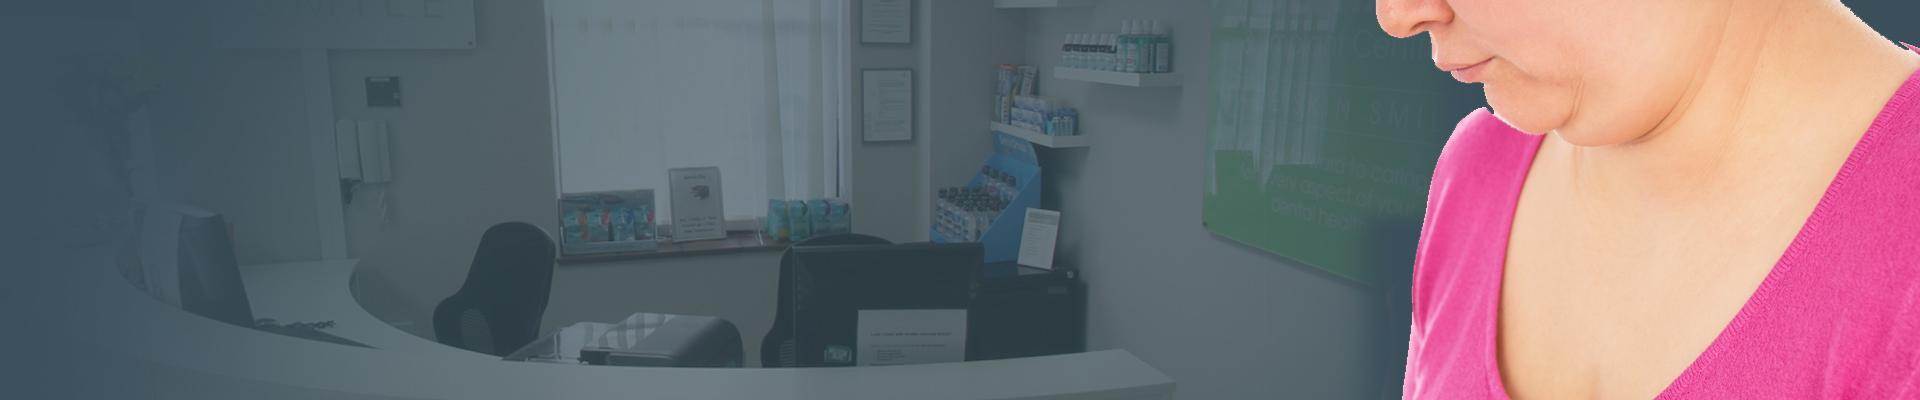 Double Chin Treatment | Belkyra | Sagging Chin | Maidstone